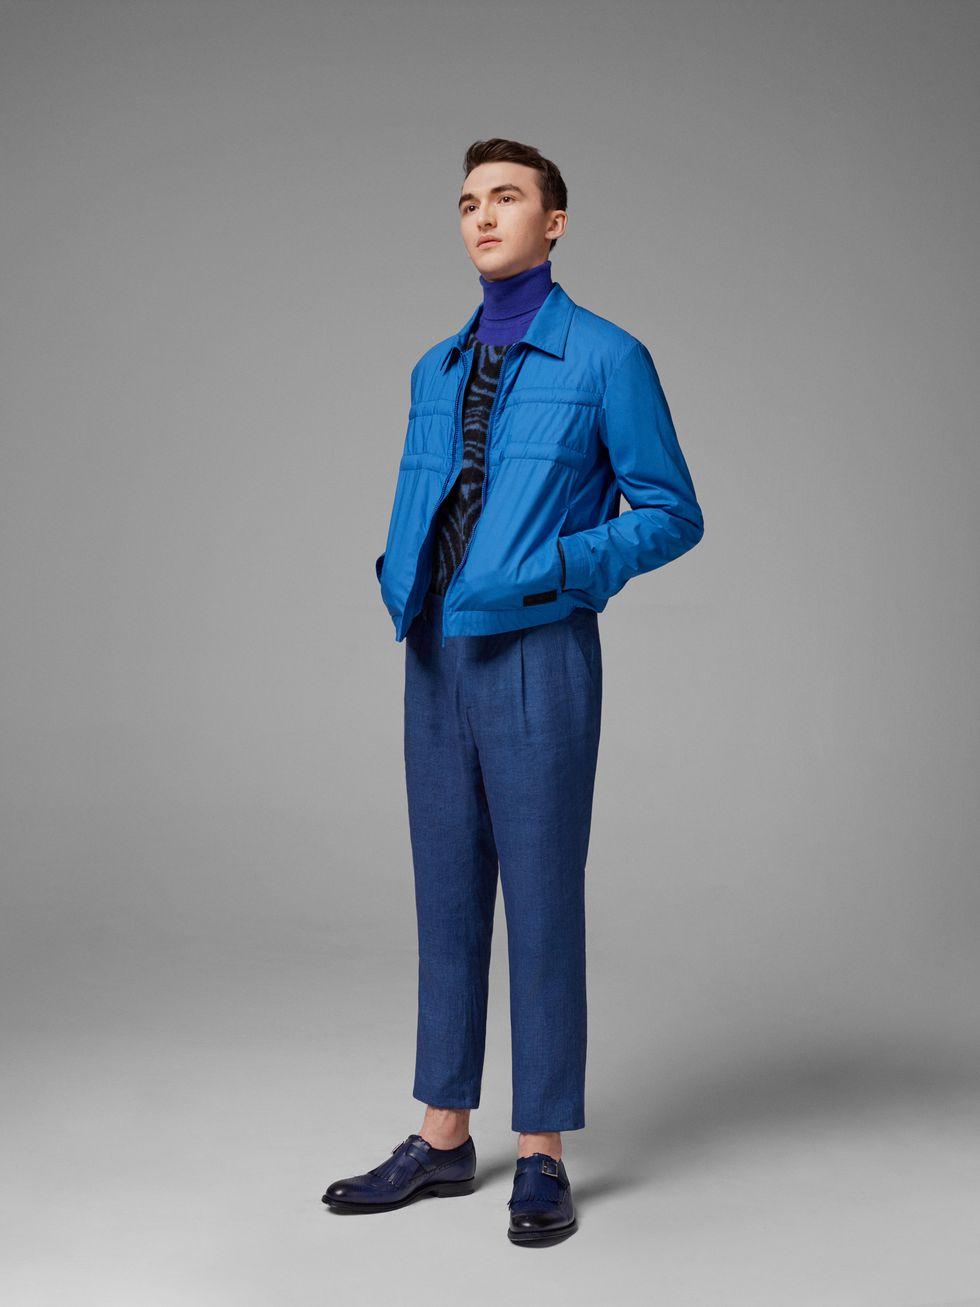 Водолазка, Mr. P; пуловер, Tiger of Sweden; бомбер, Moncler Genius x Craig Green; брюки, Etro; ботинки, Grenson